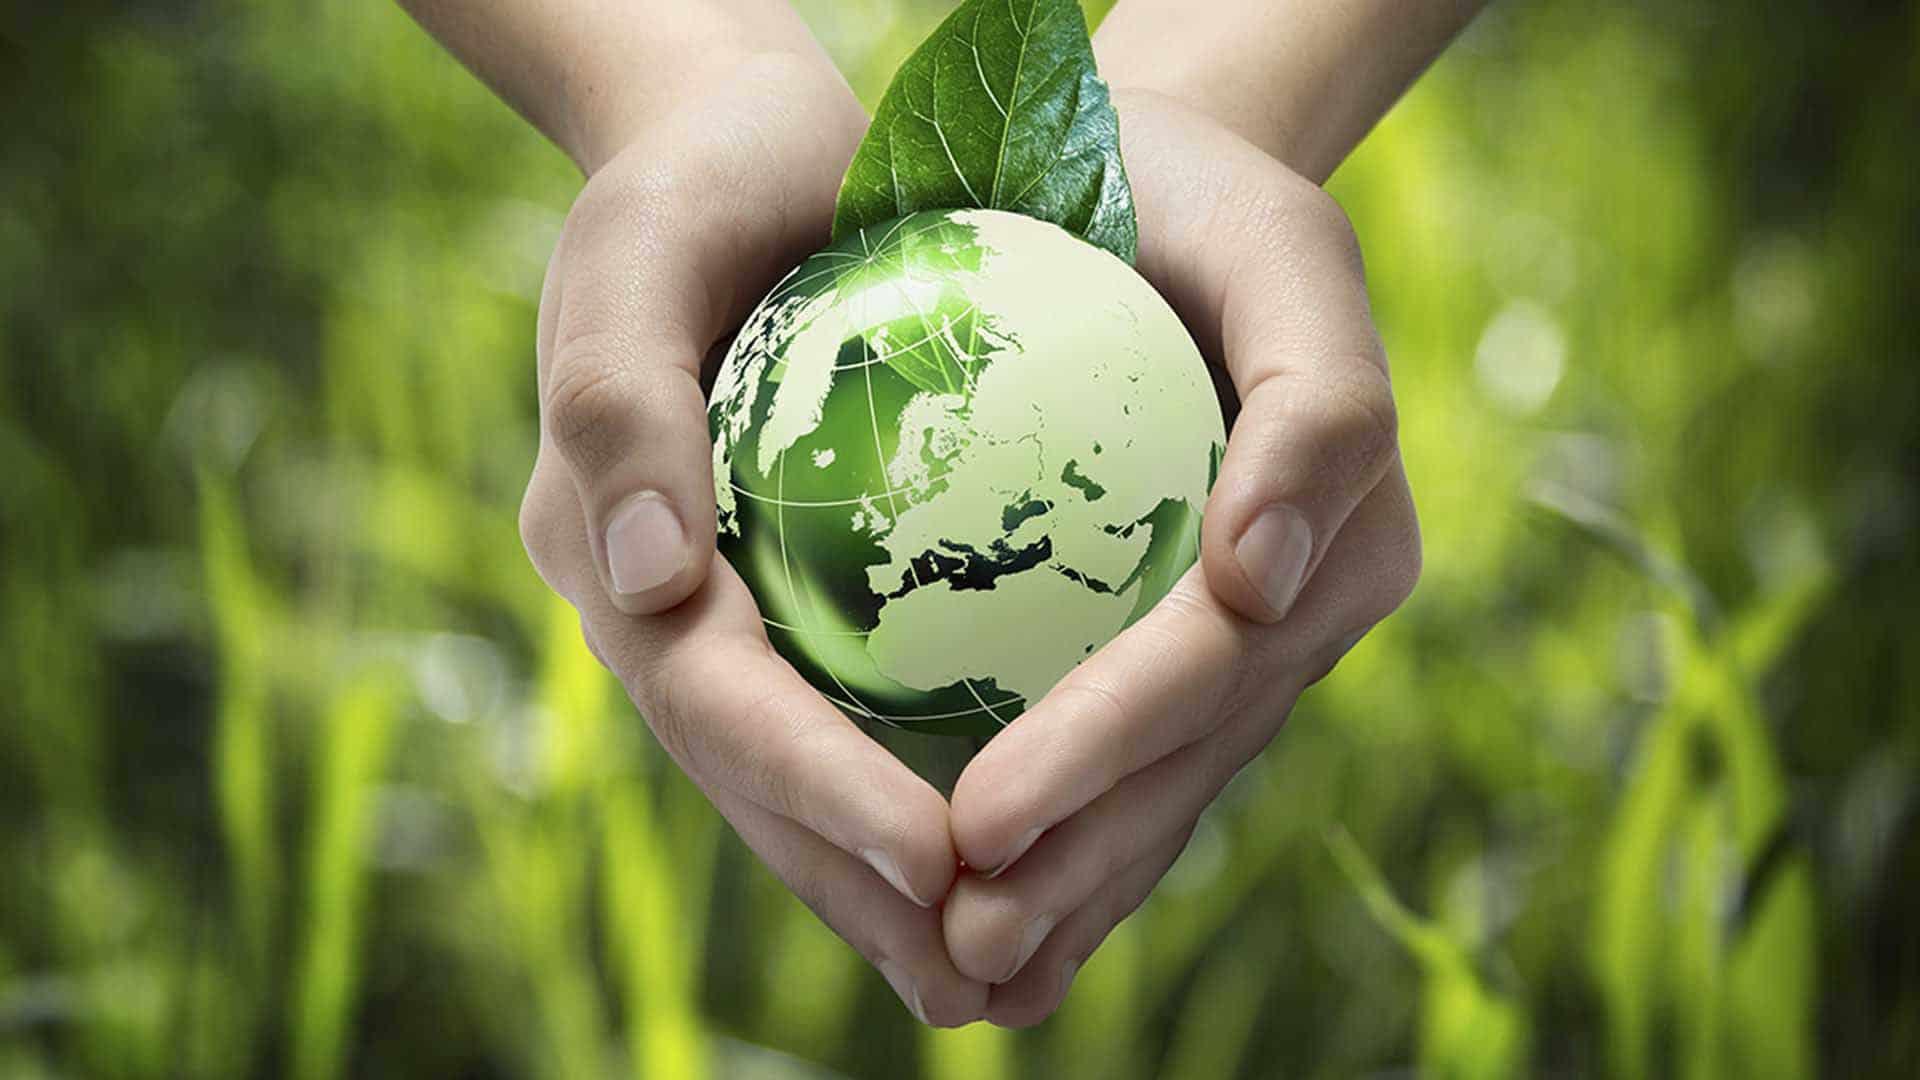 Schools Key to Develop Eco-Friendly & Safe World